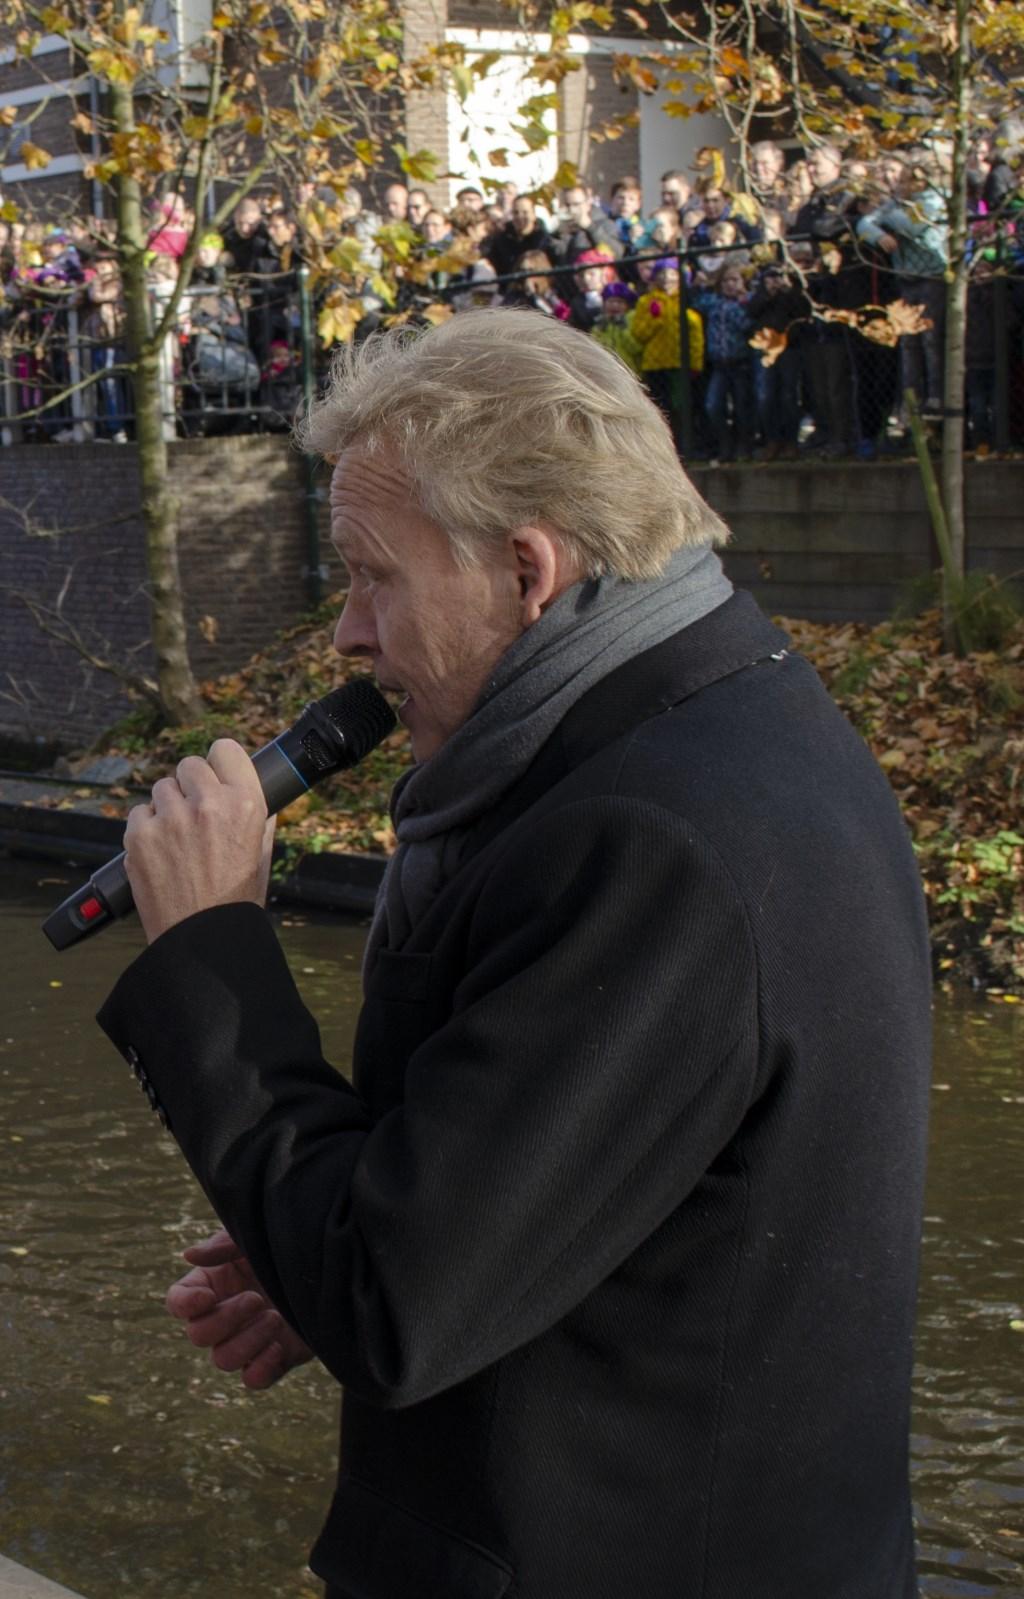 Foto: Bo van Uden © MooiBoxtel